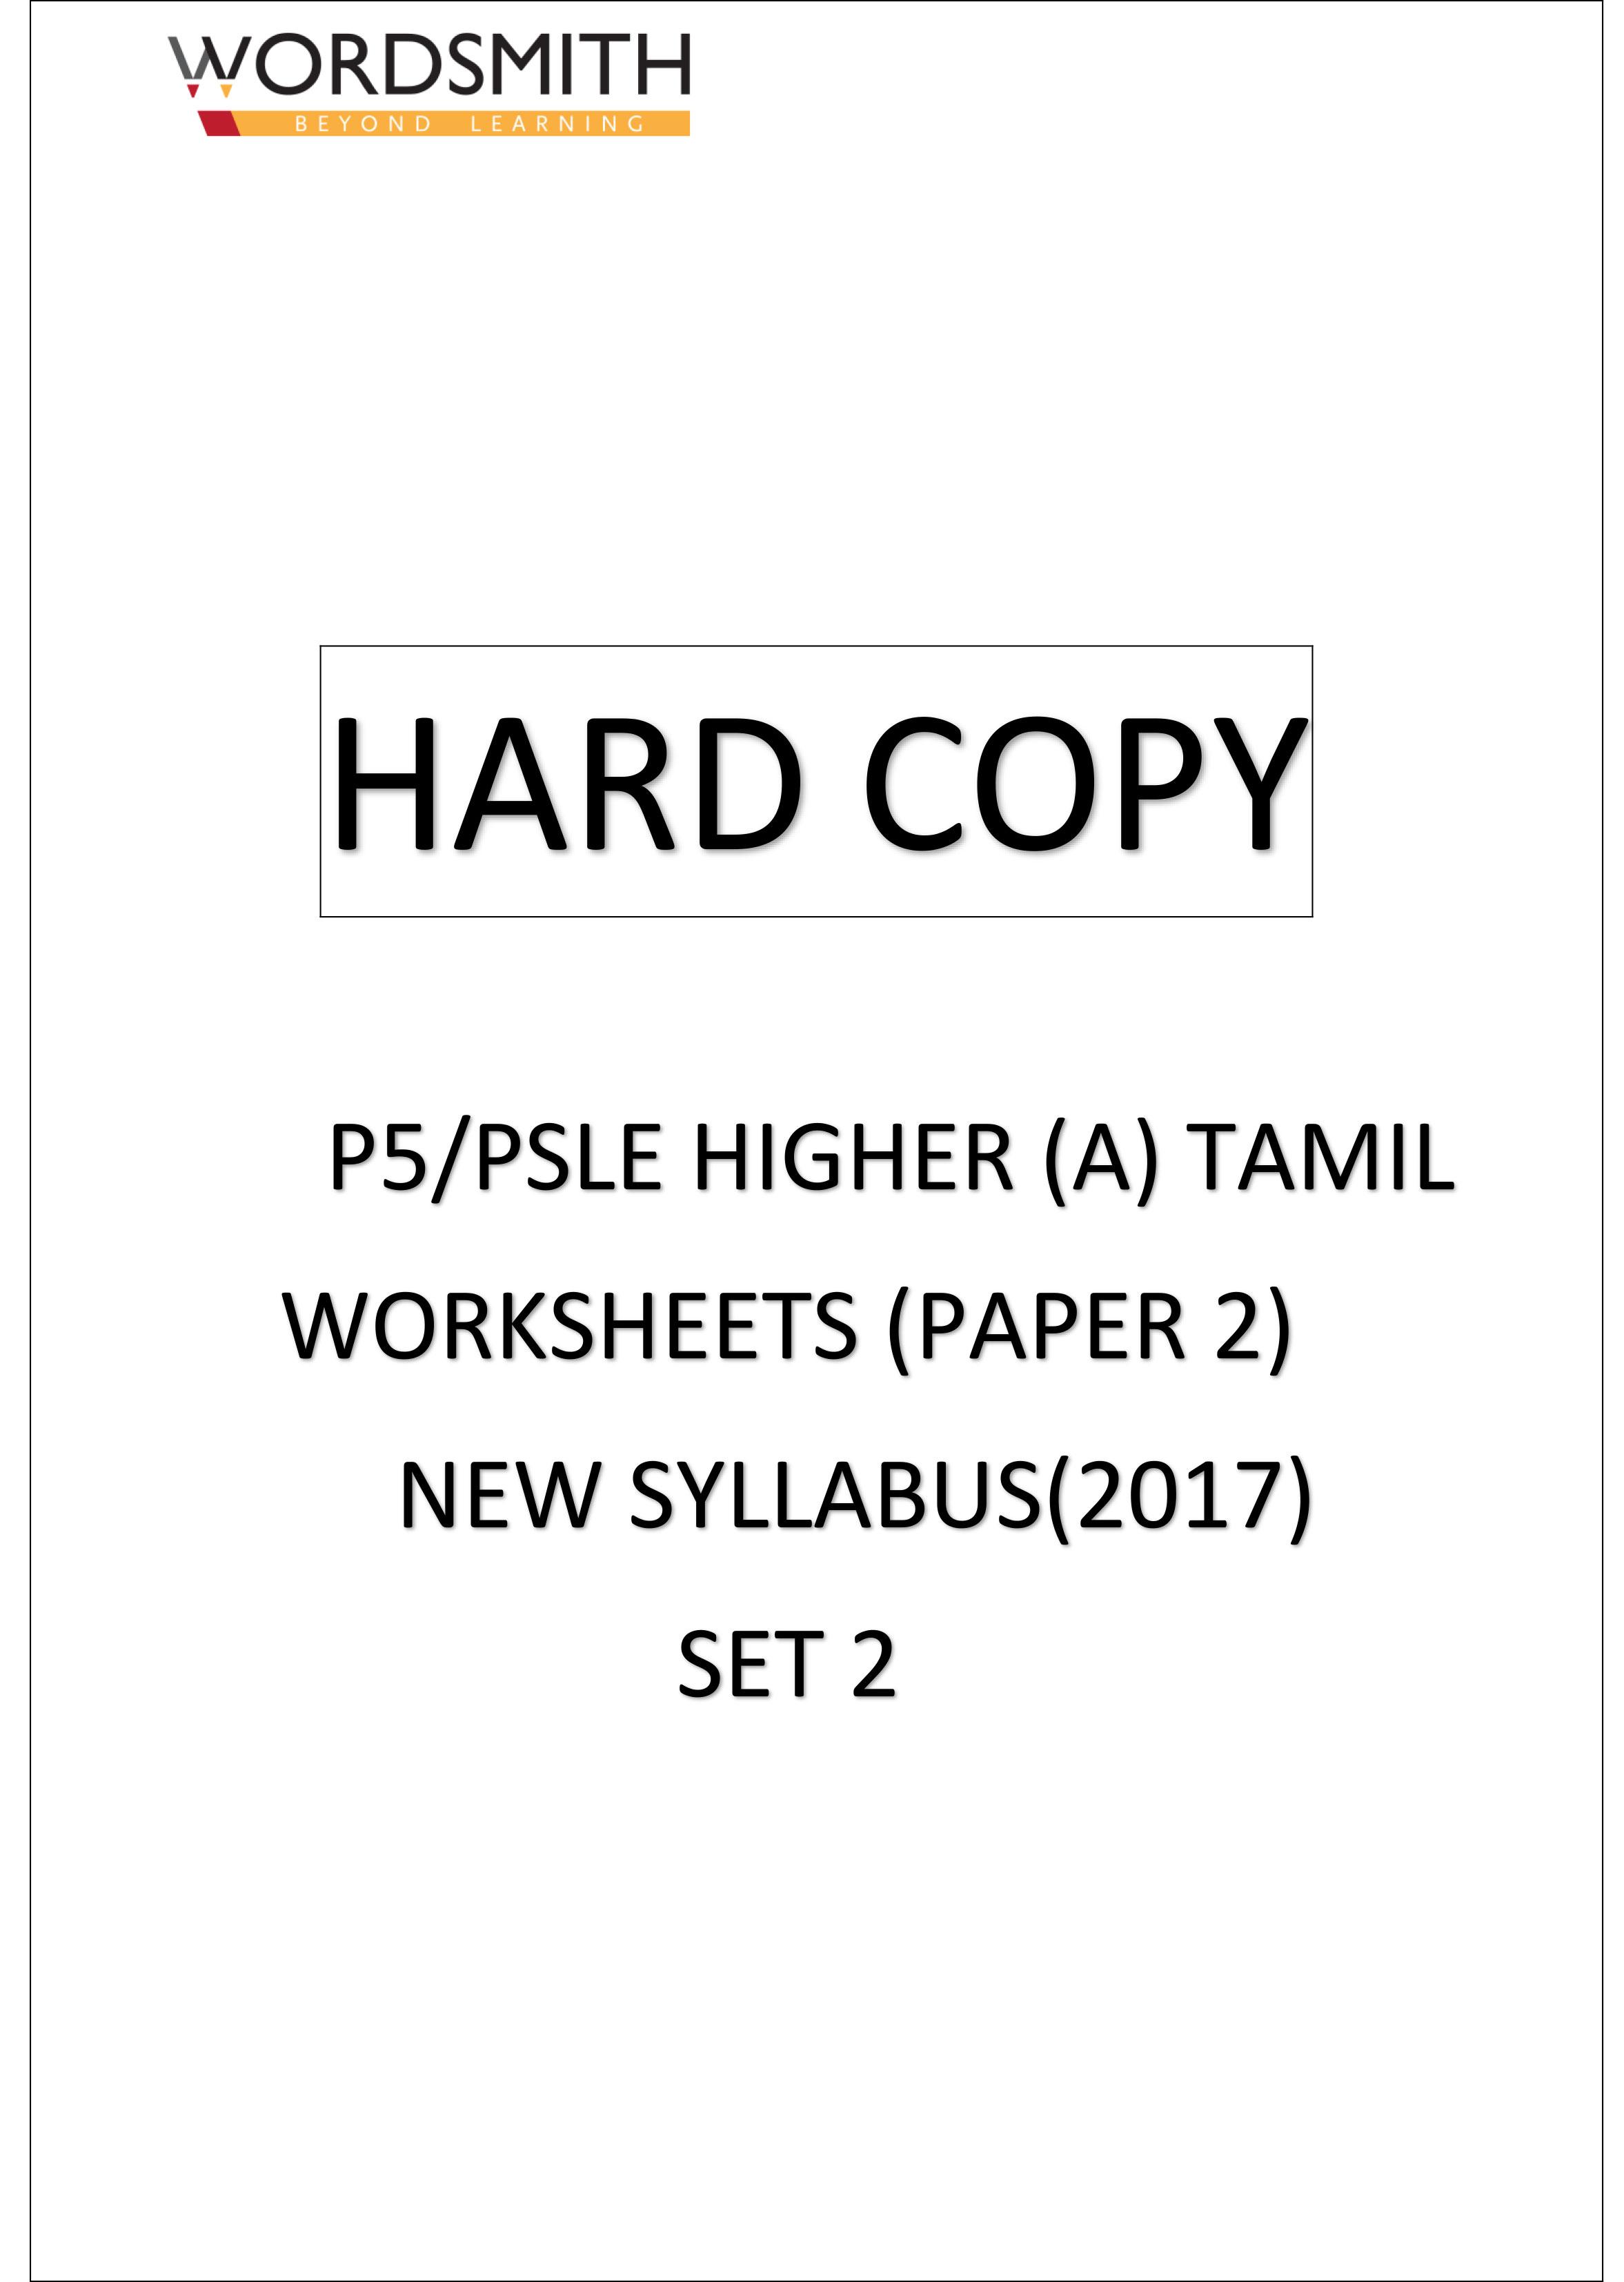 Spiral Binding Primary 5 Higher Tamil Worksheets